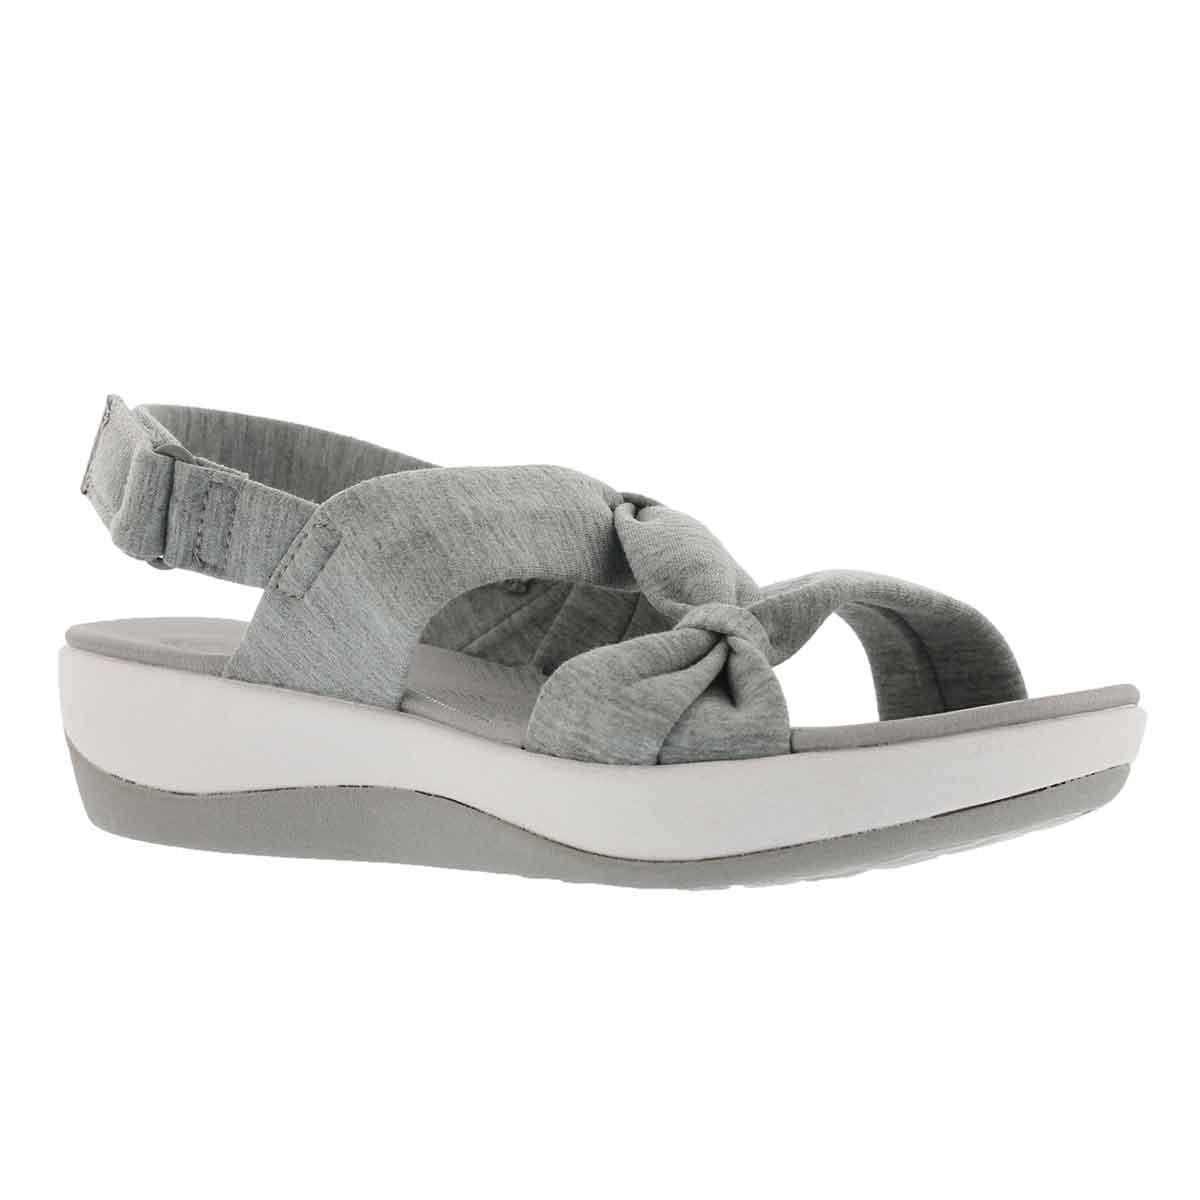 Lds Arla Primrose grey wedge sandal